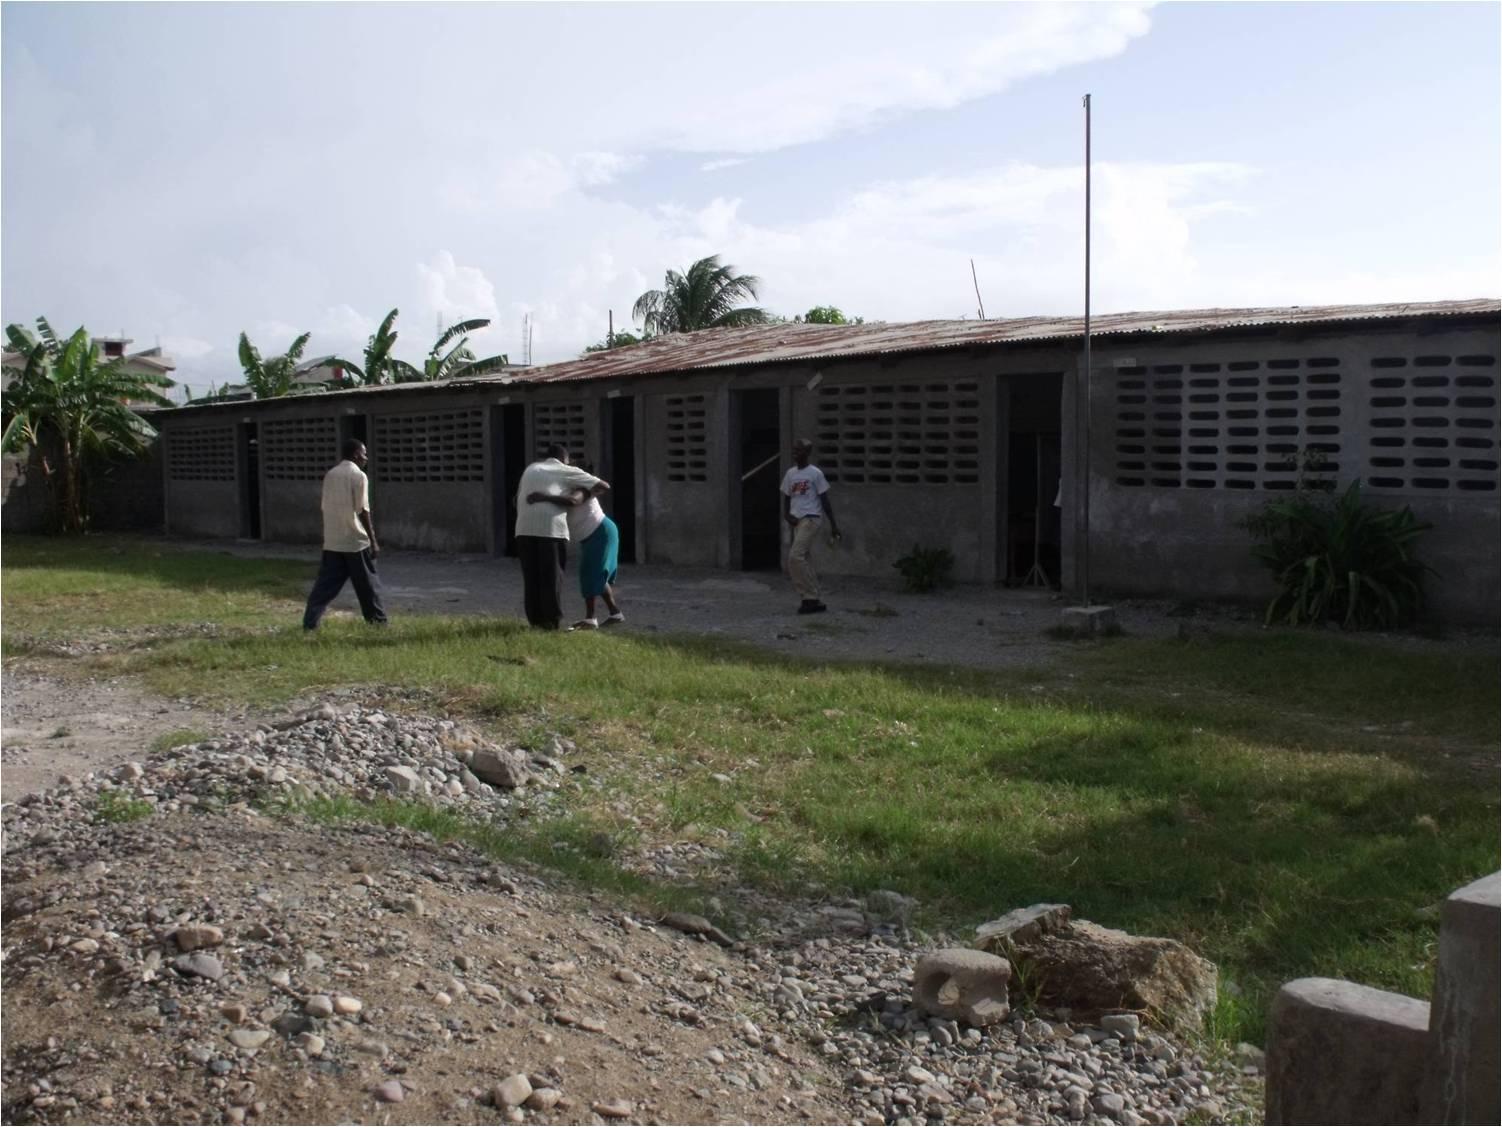 School in Cap-Haitian